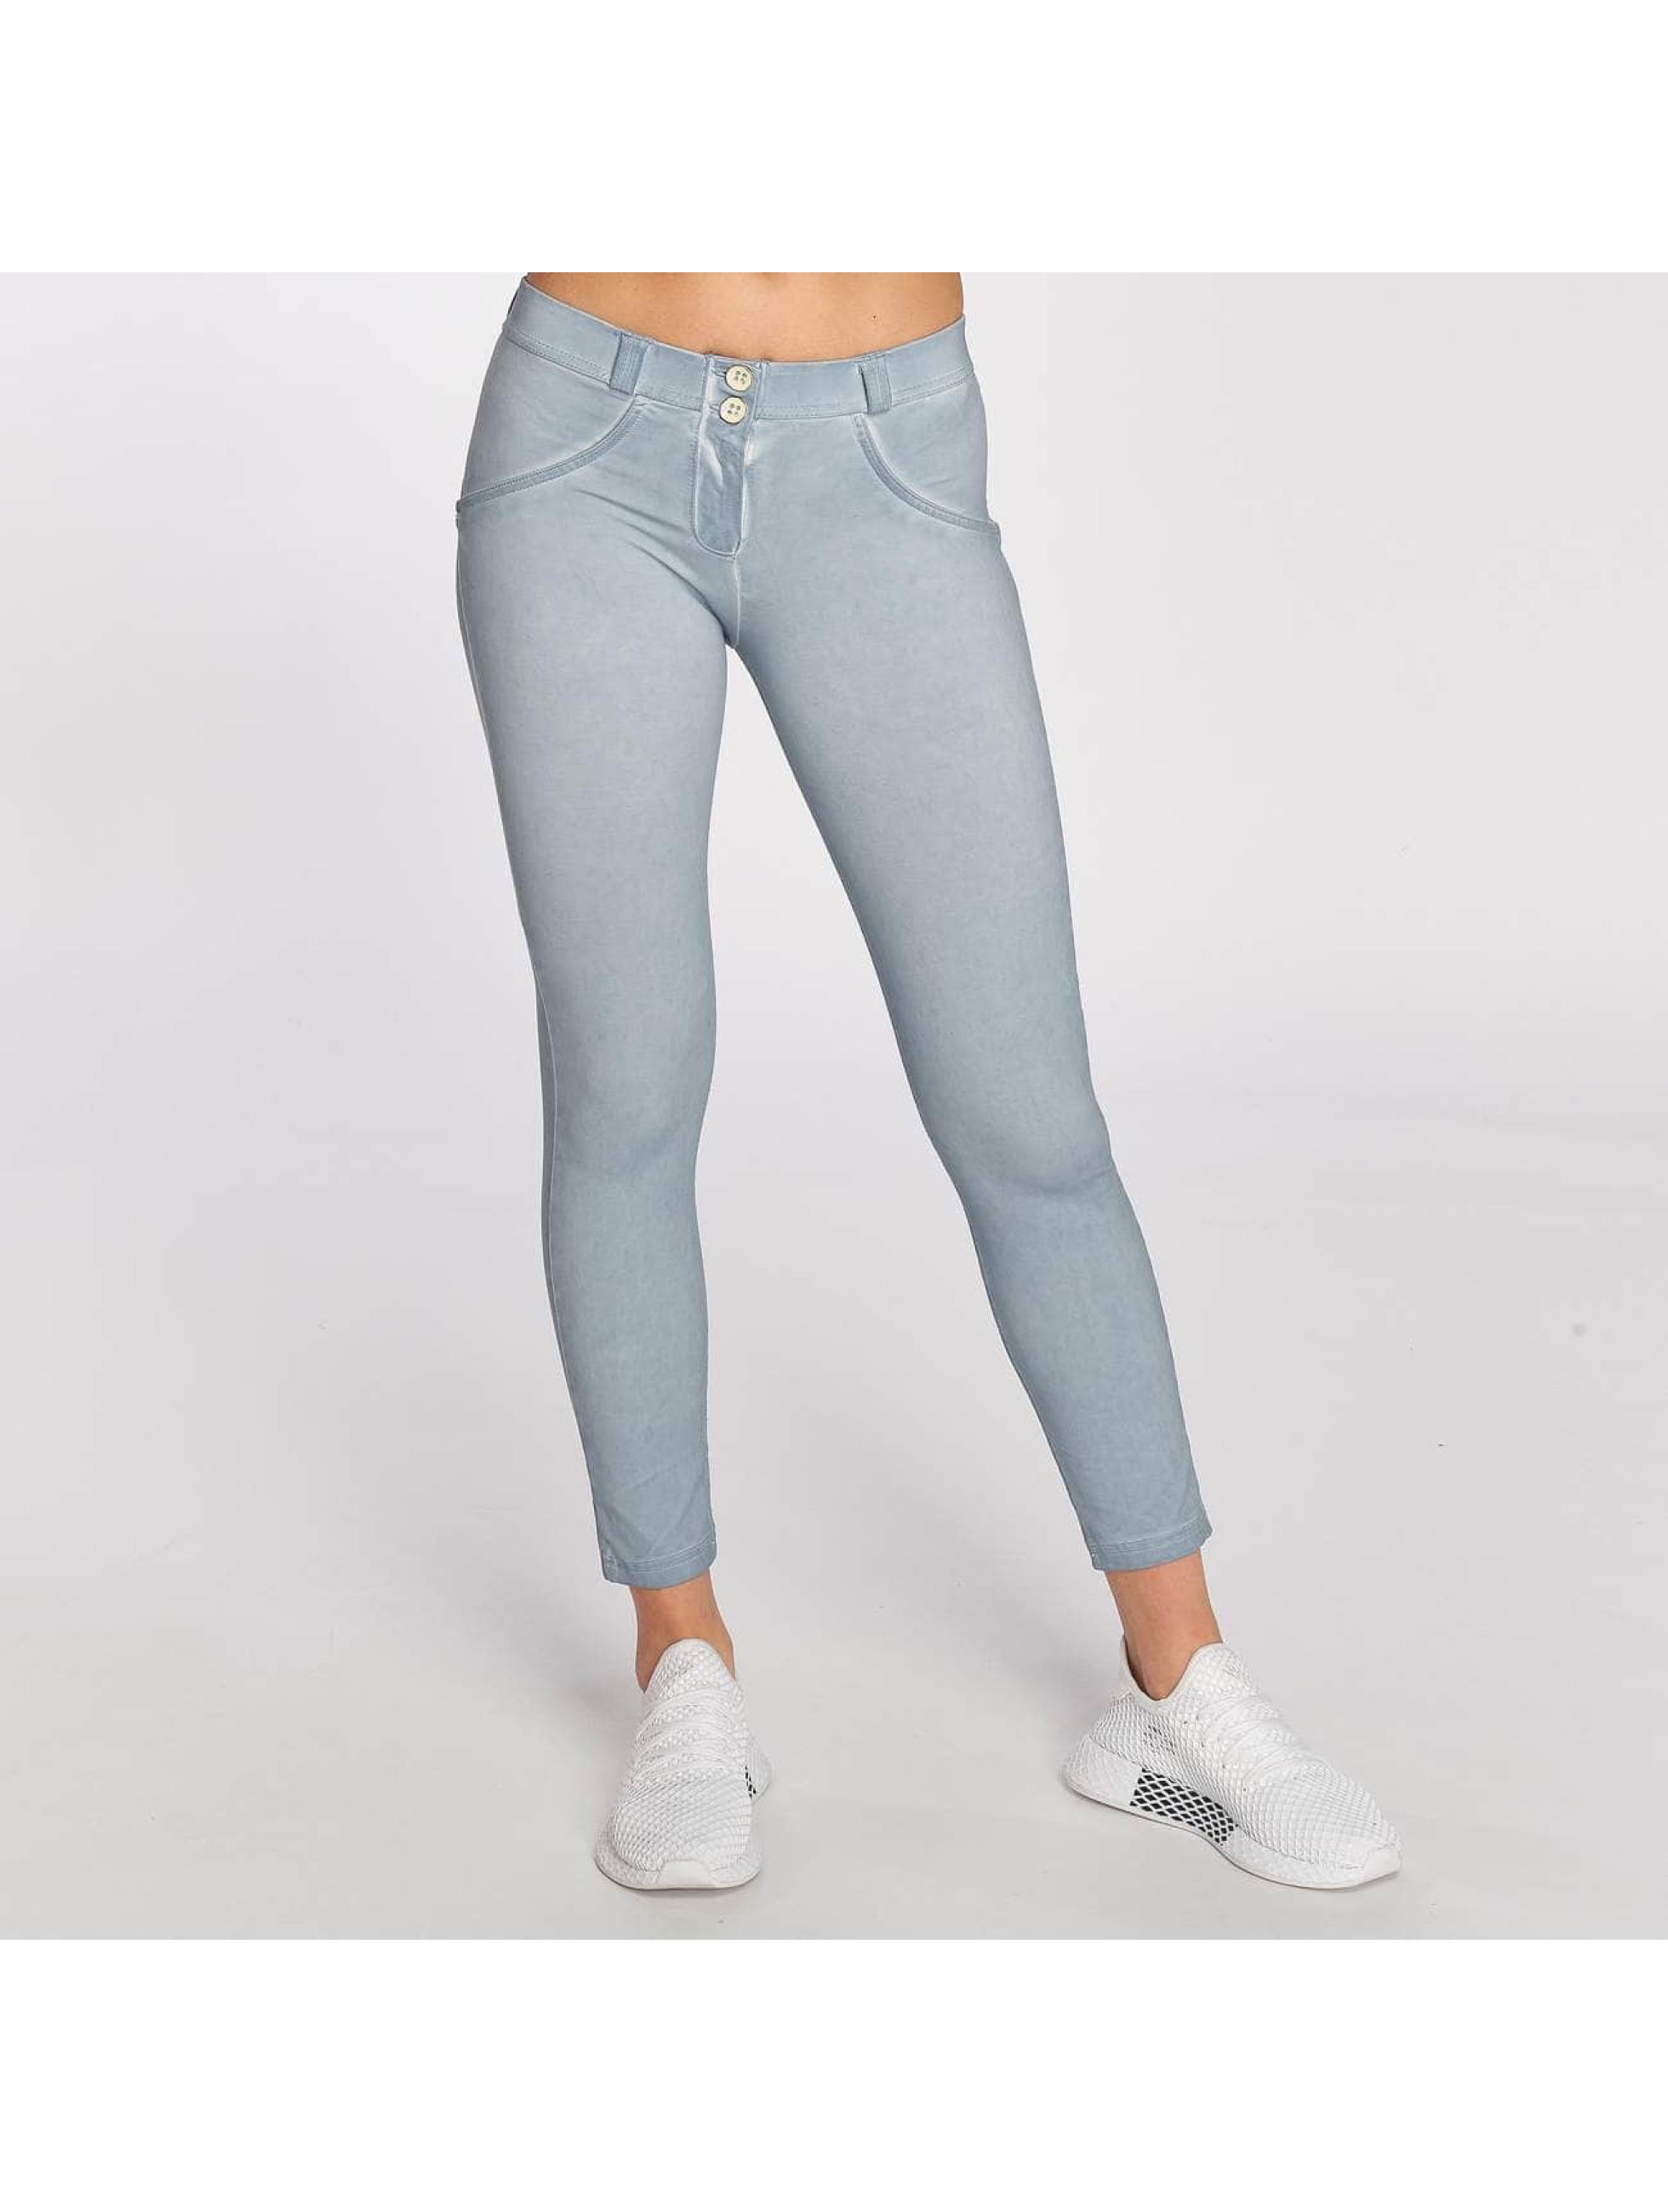 Freddy Skinny Jeans Pantalone 7/8 modrý